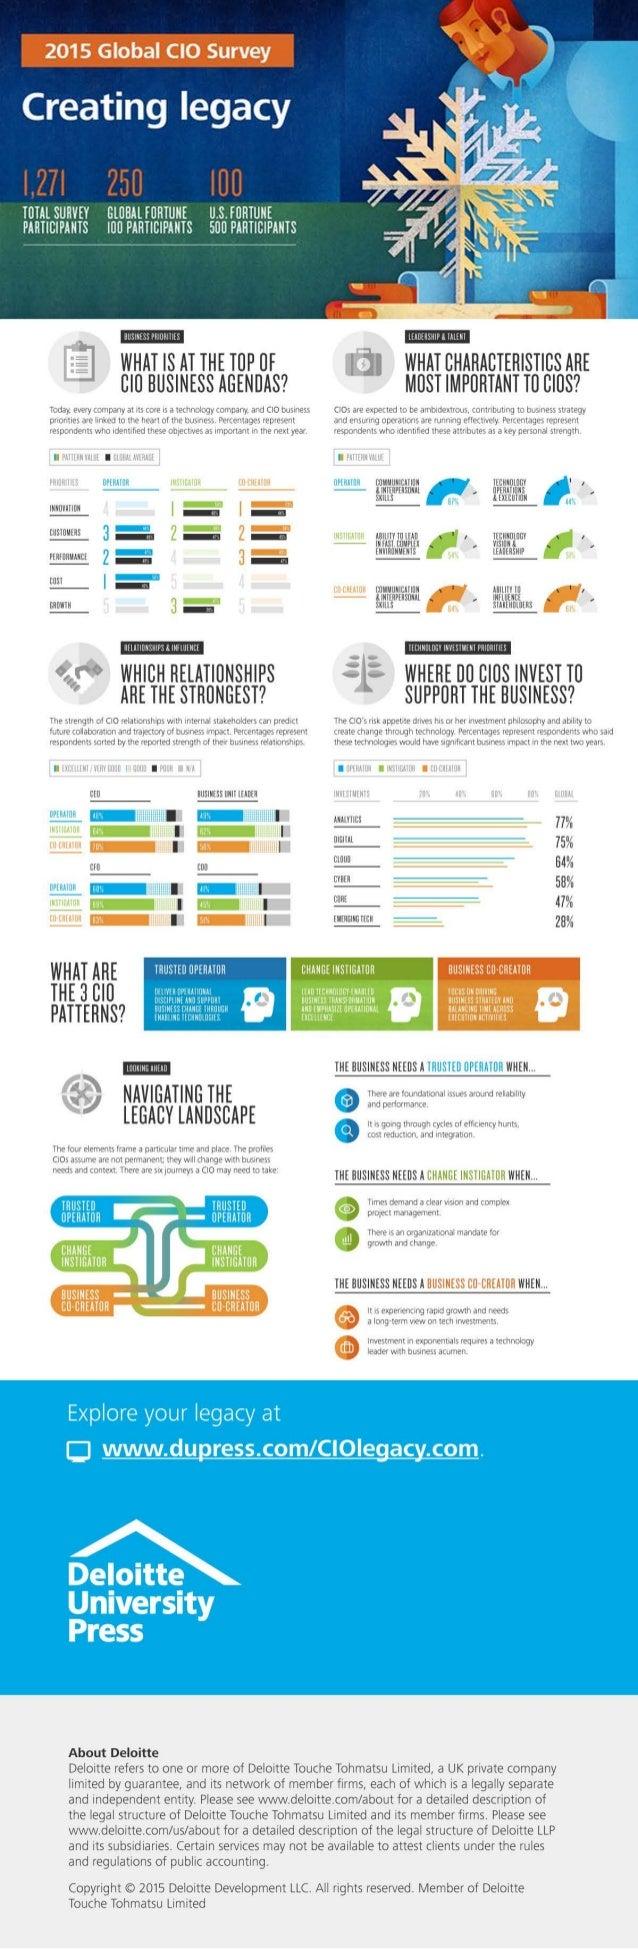 2015 global CIO survey: Creating legacy